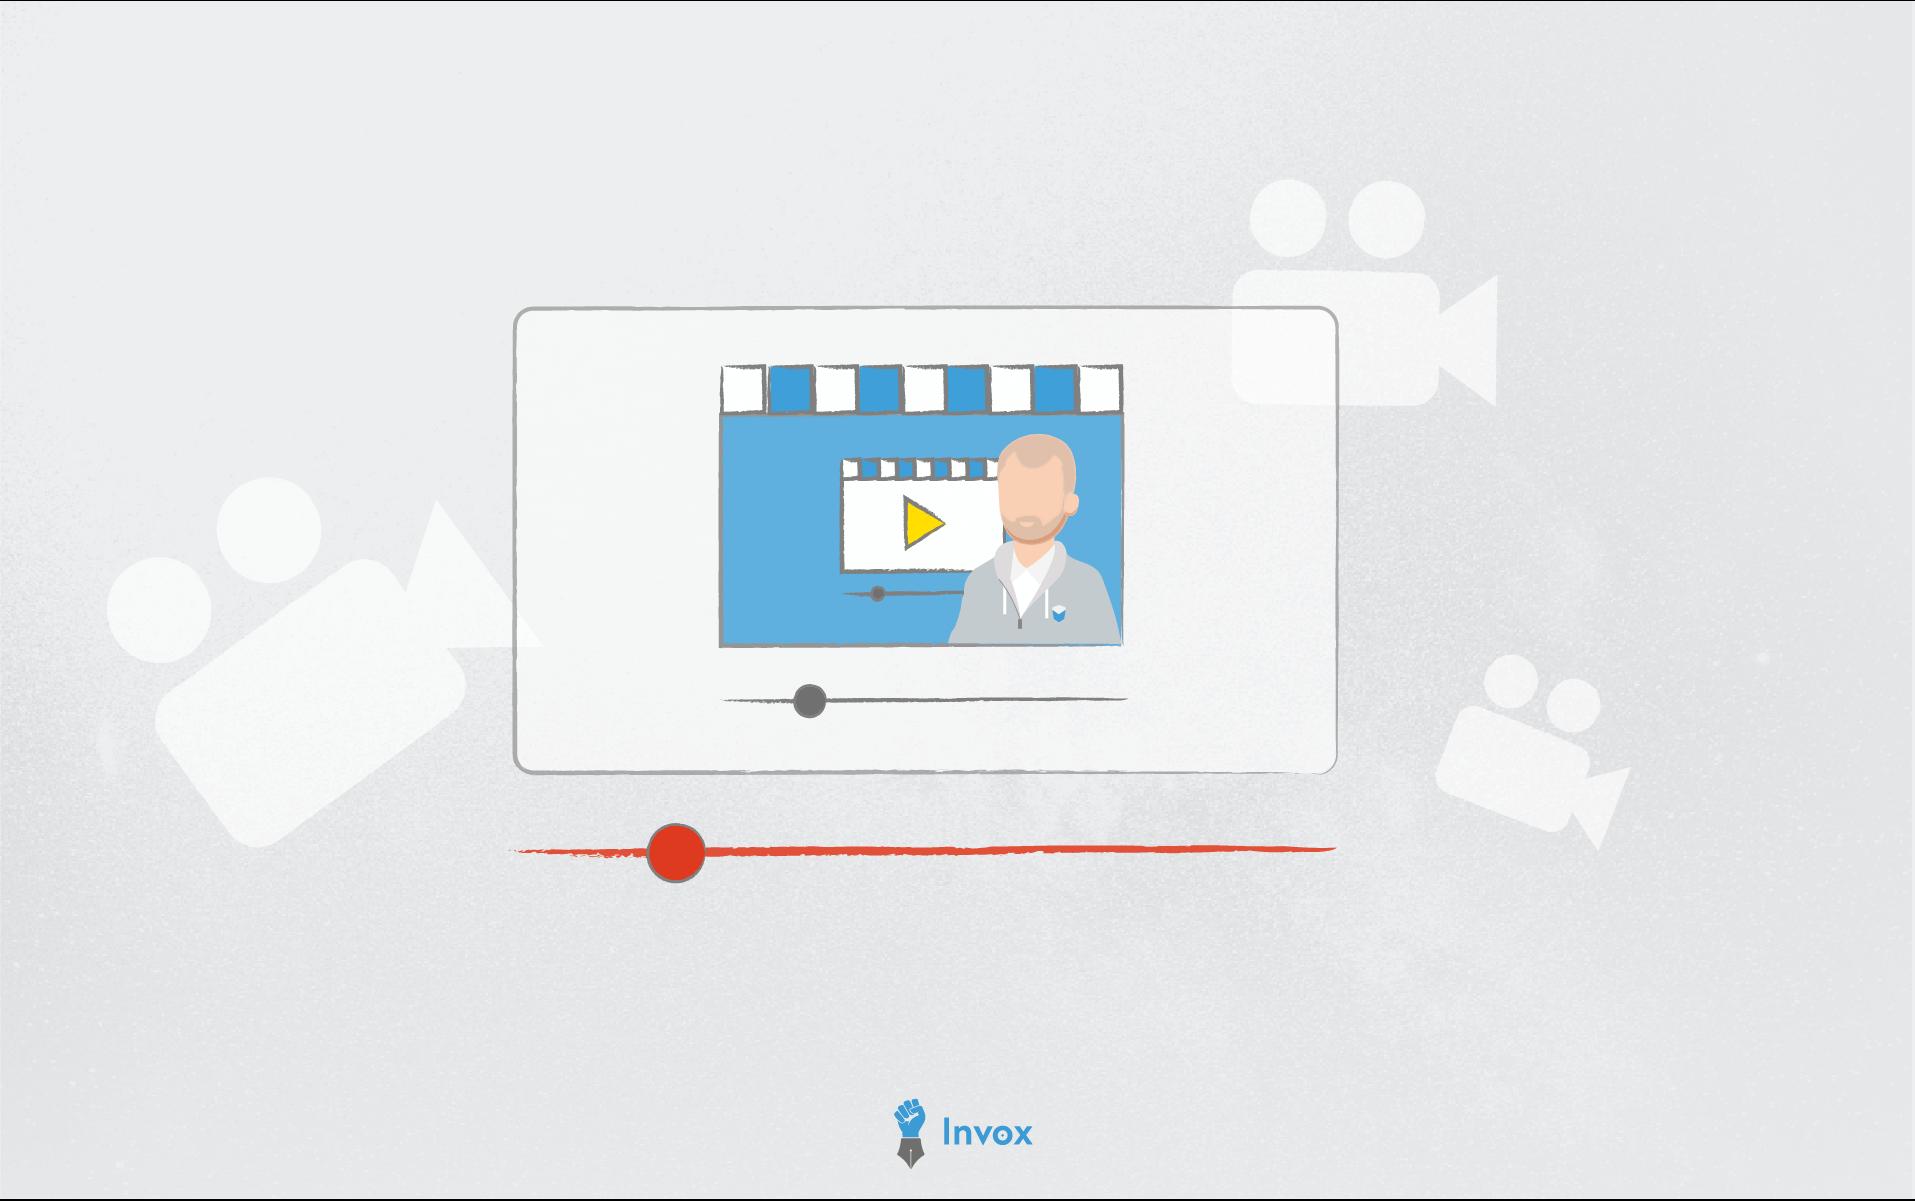 vidéos content marketing